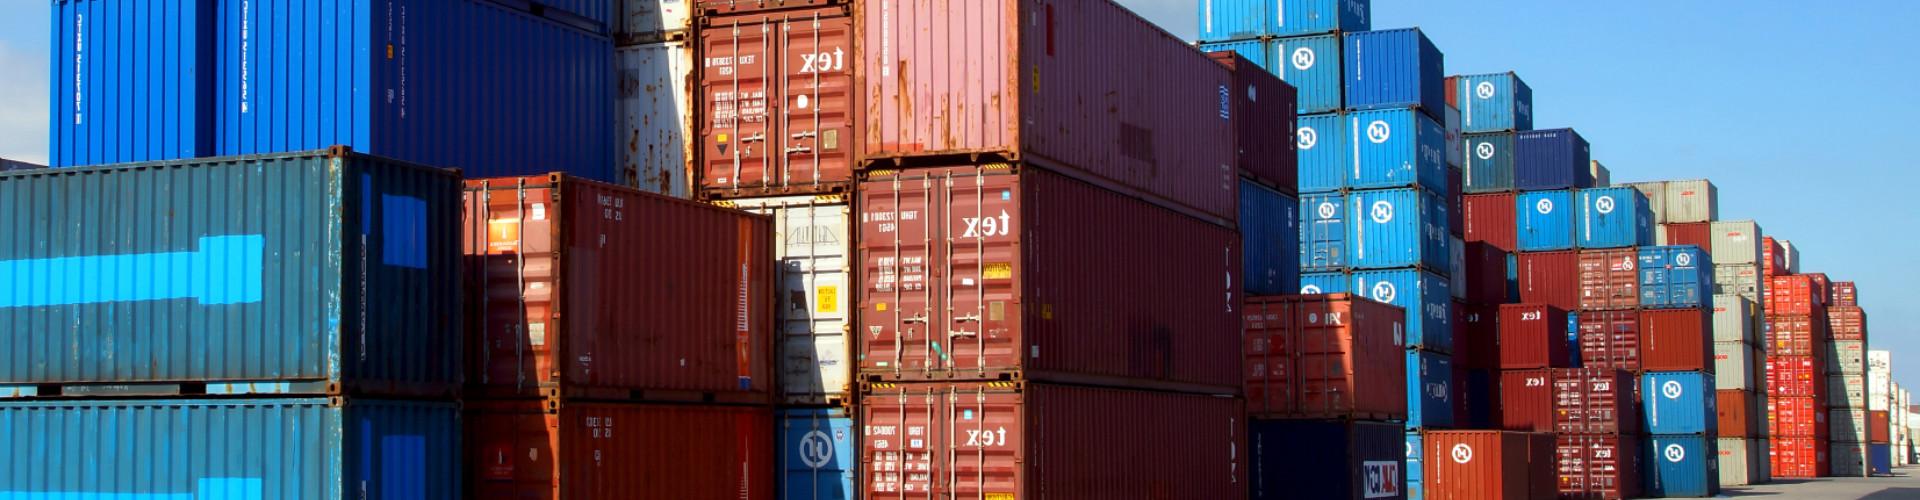 Gestapelte Container © stock.adobe, stock.adobe